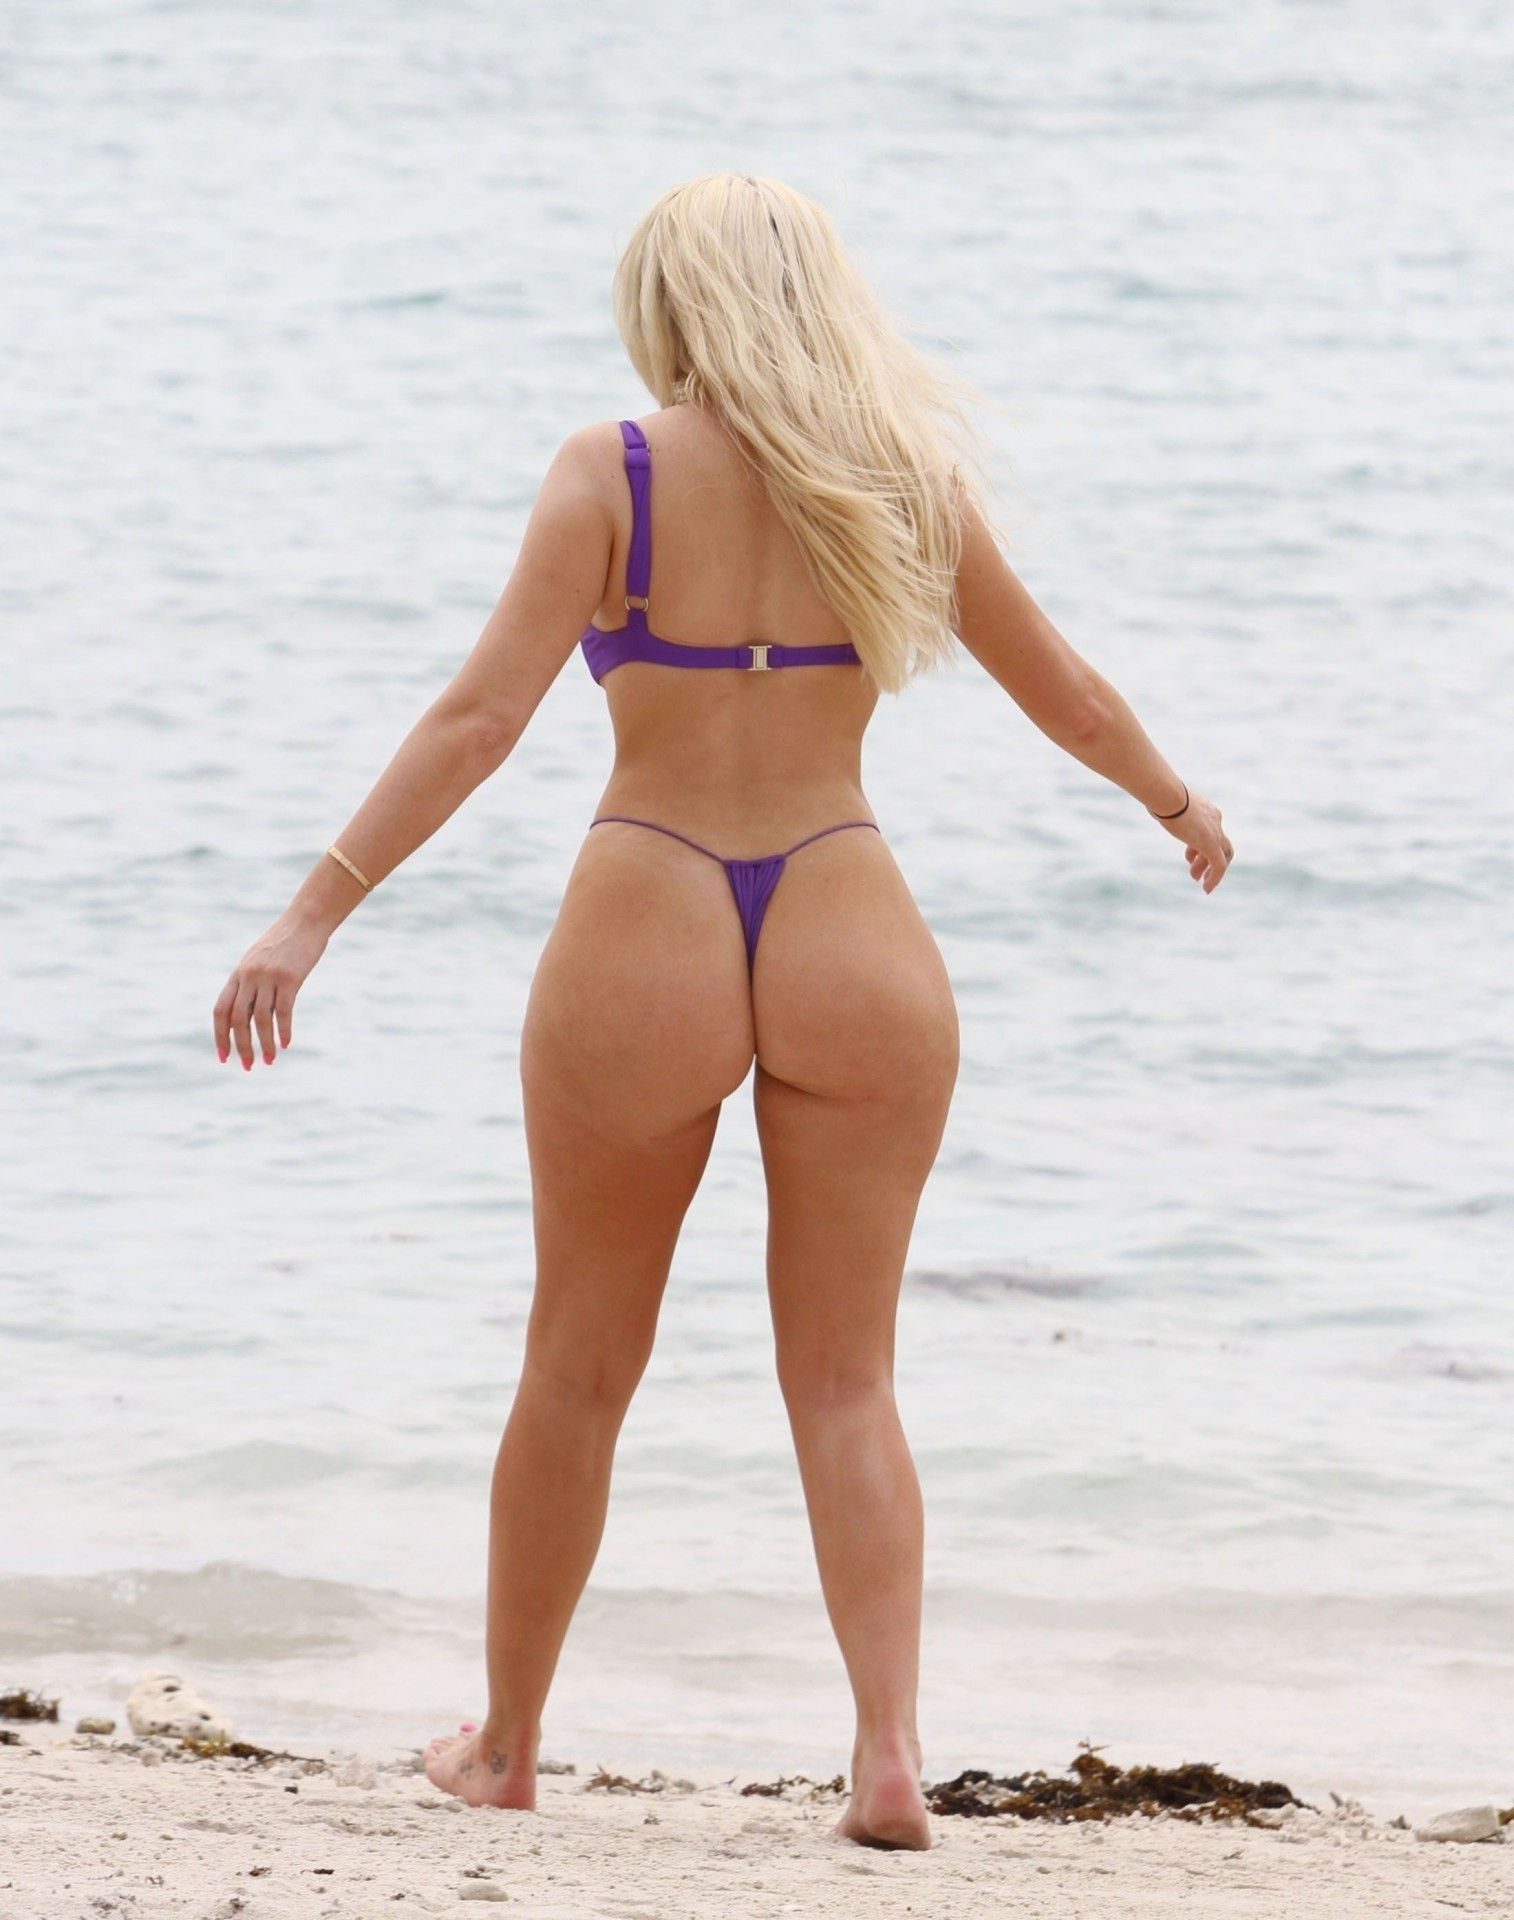 Chloe Ferry Hot Boobs And Ass